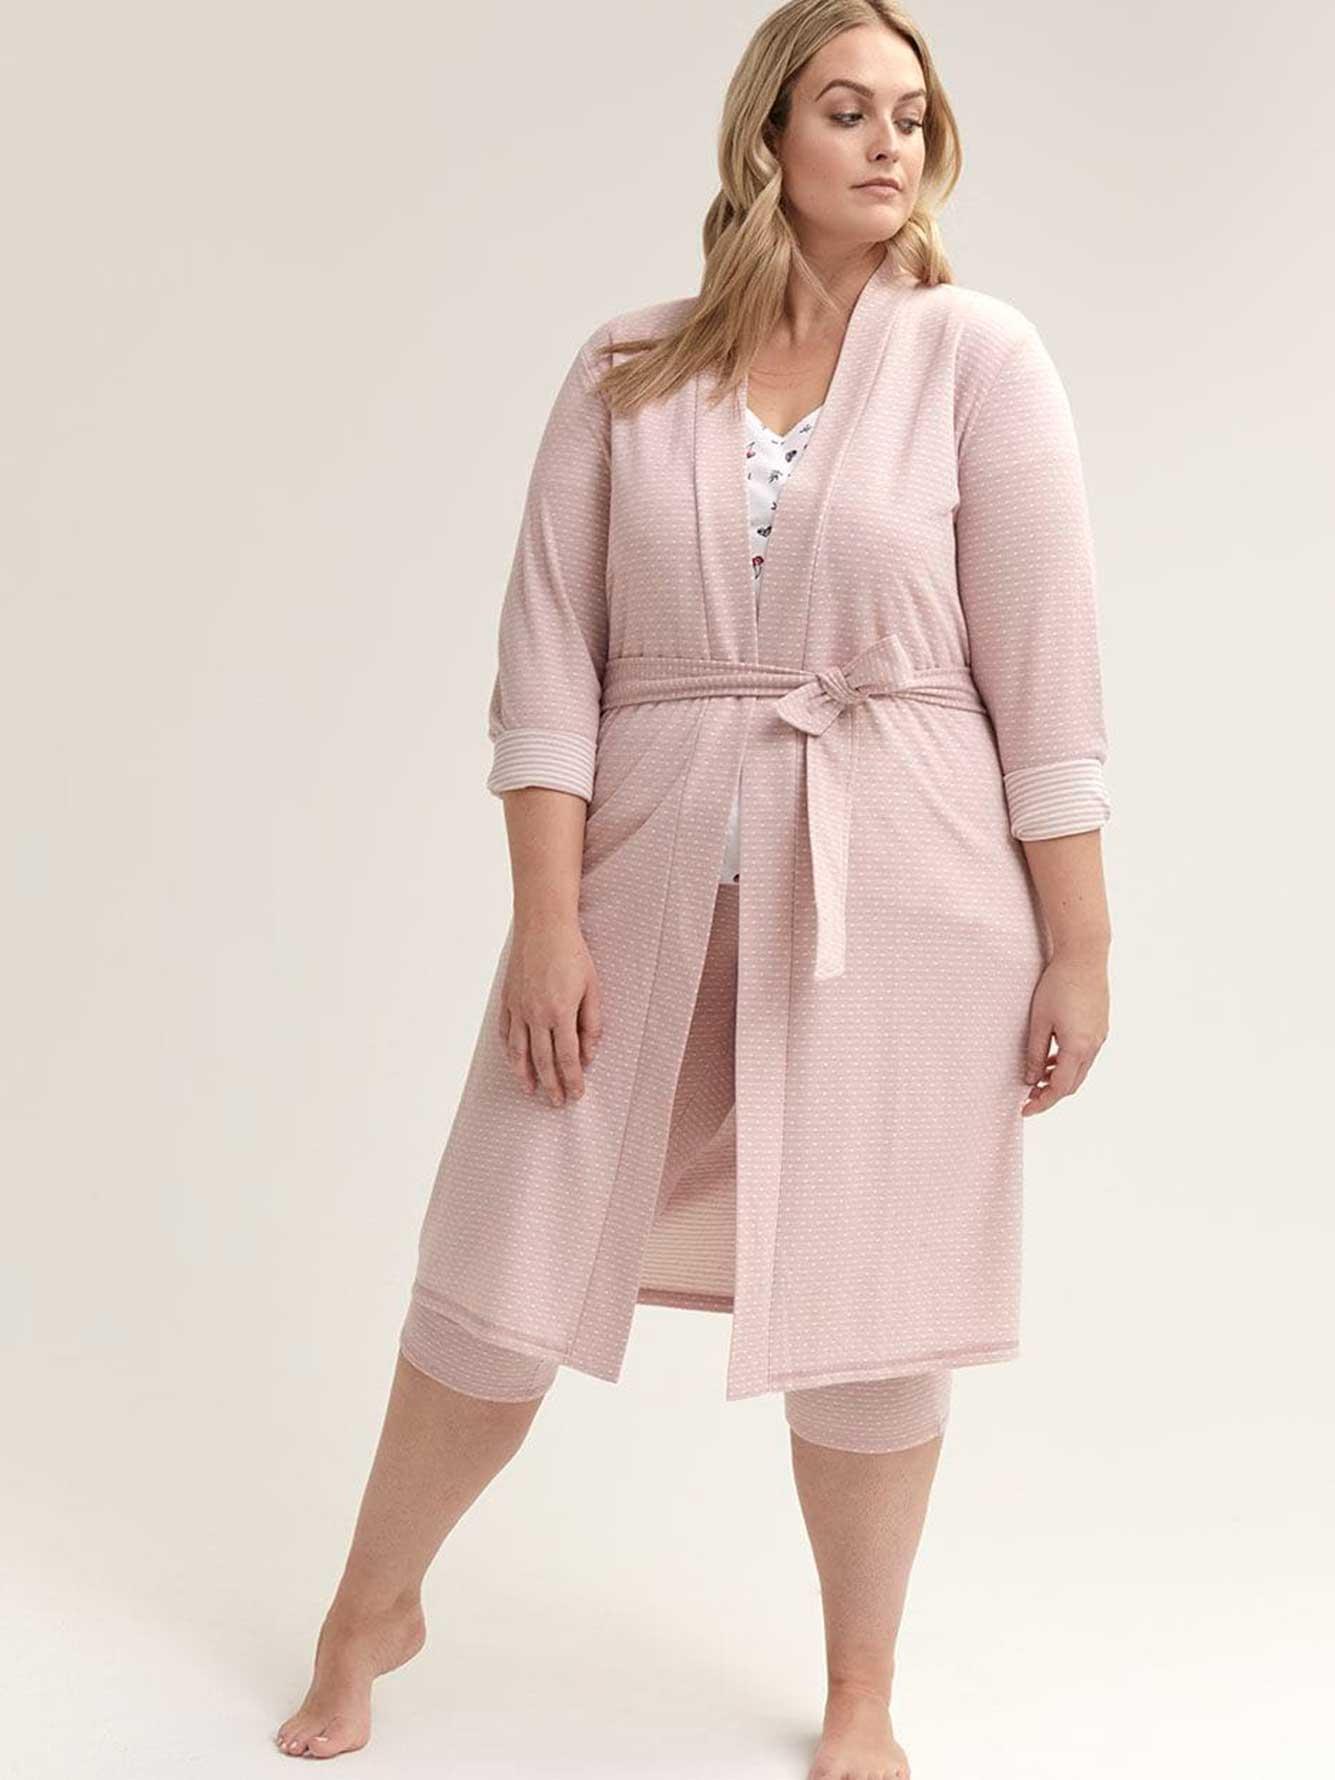 Voglio Lounge Ti Sleeve With Long Robe Belt cF1lKJT